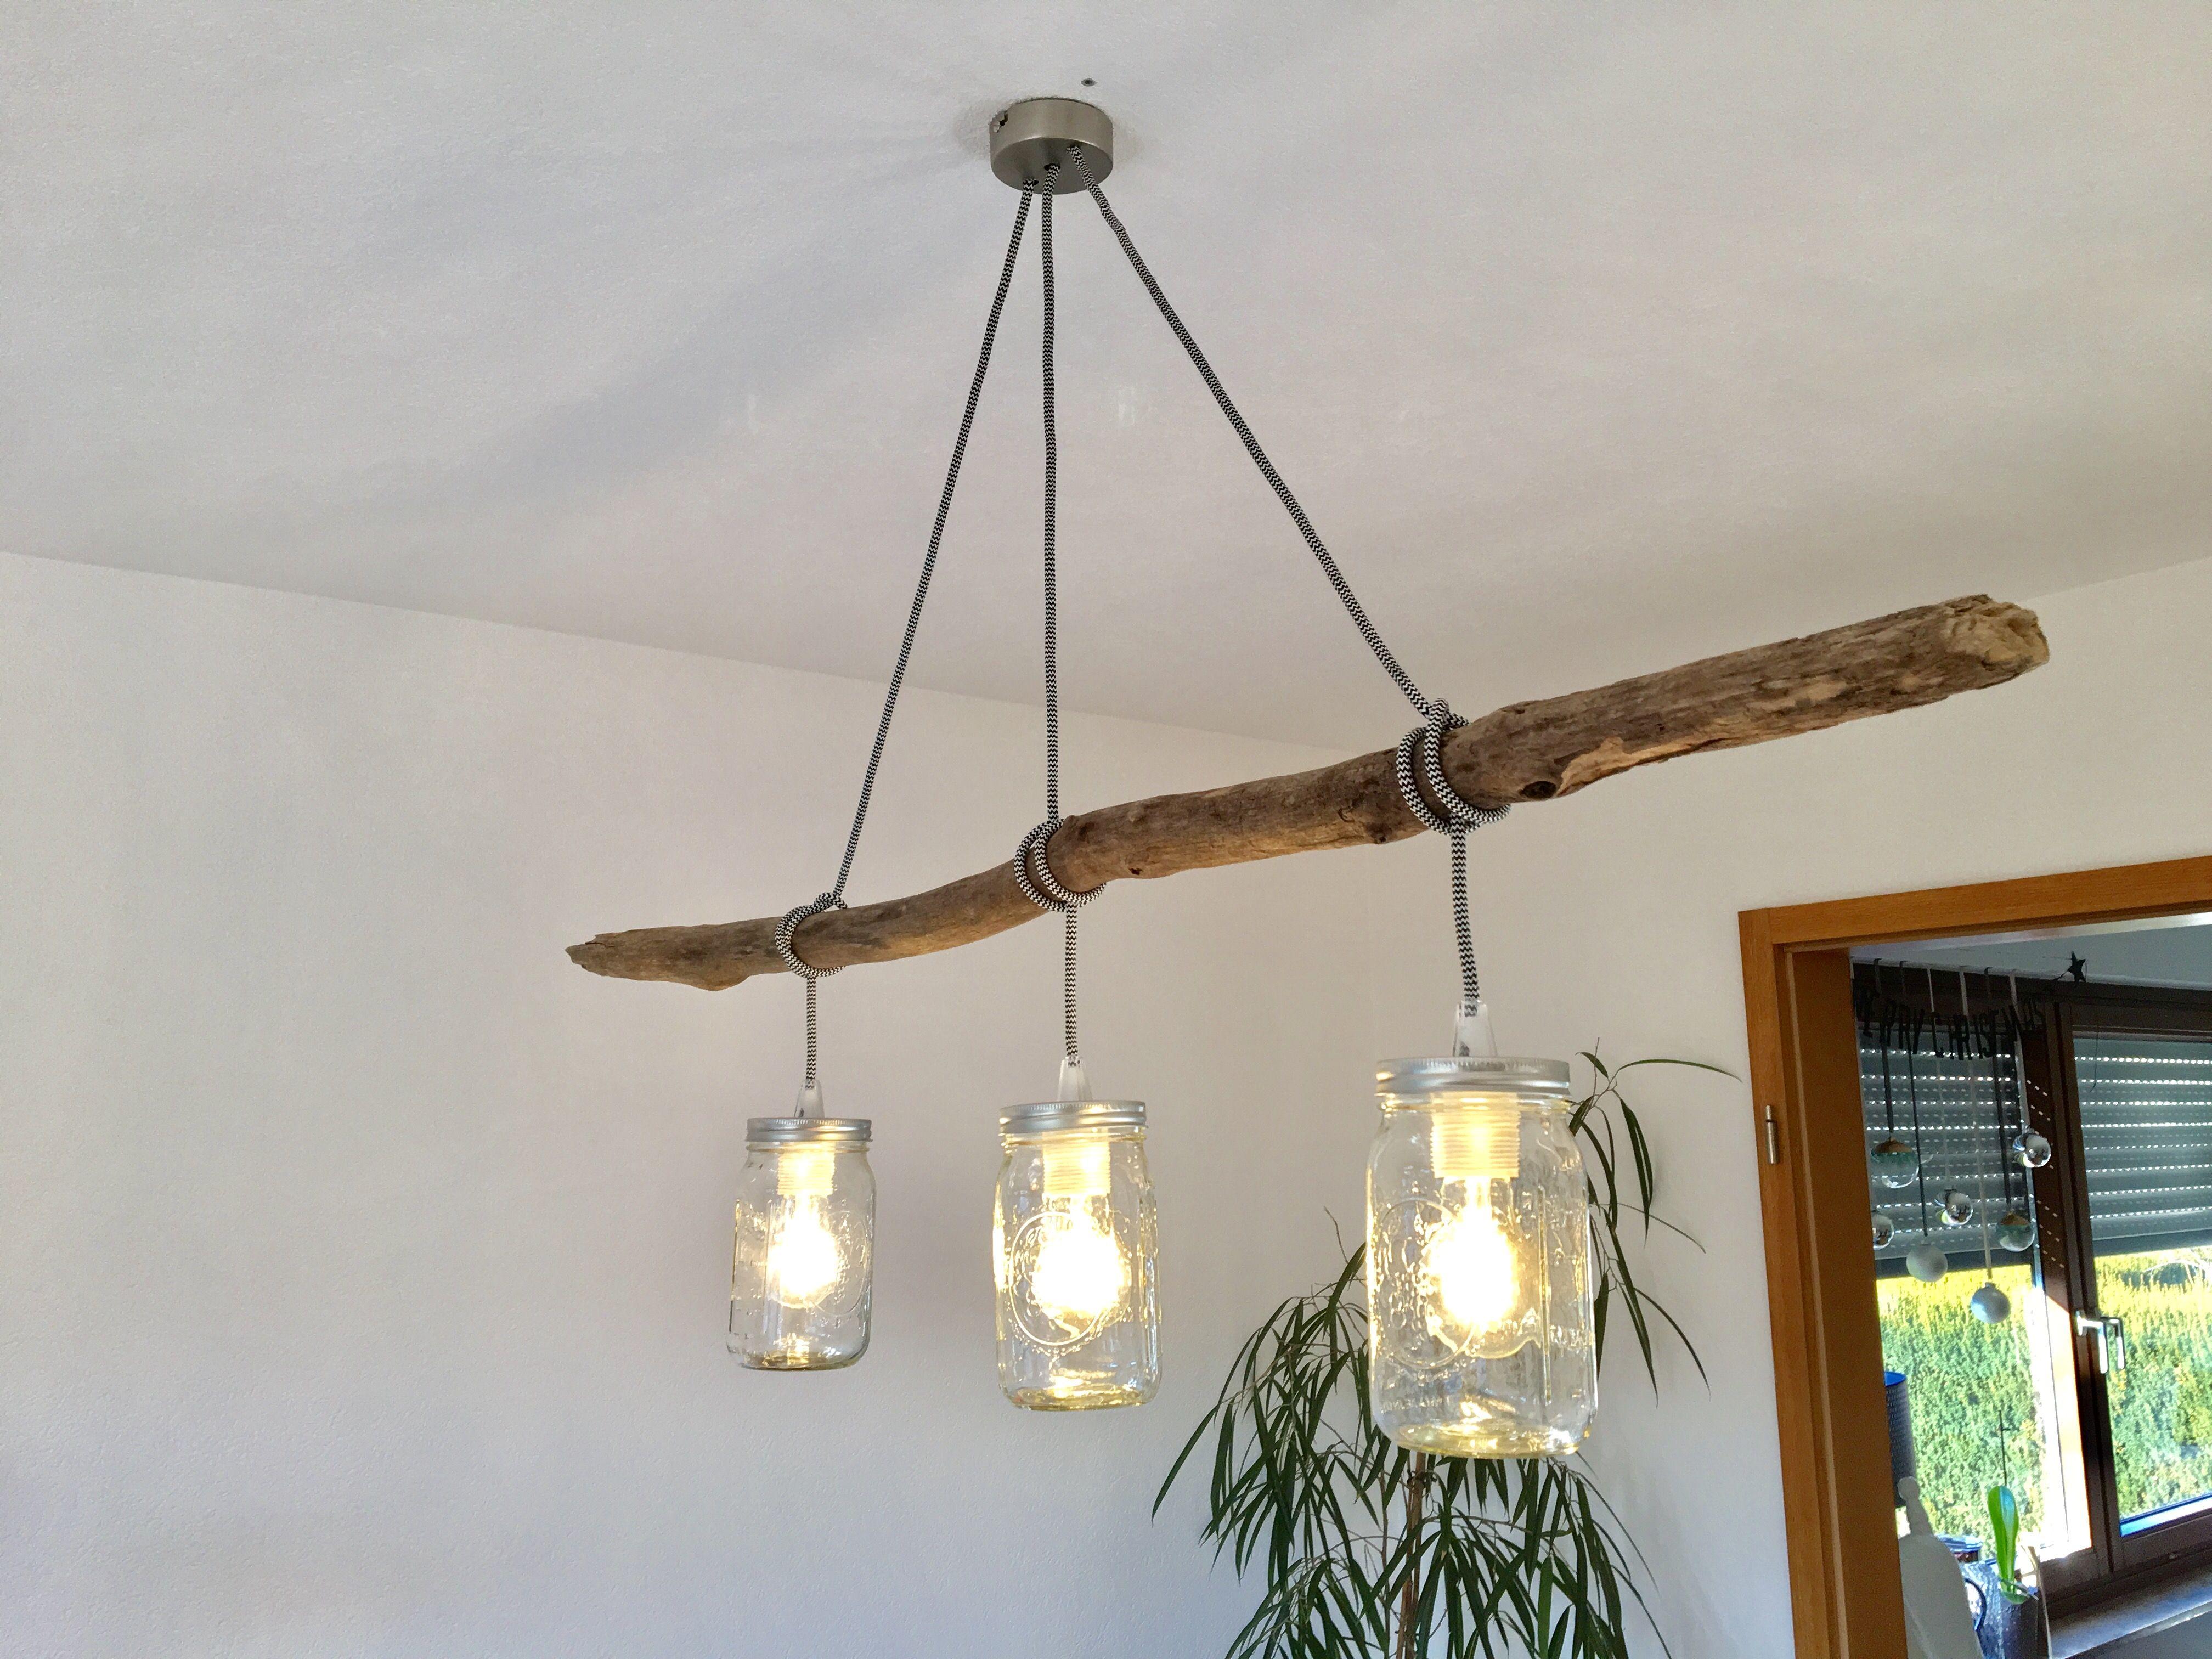 Homemade lampe with branch Selbstgemachte Esstischlampe